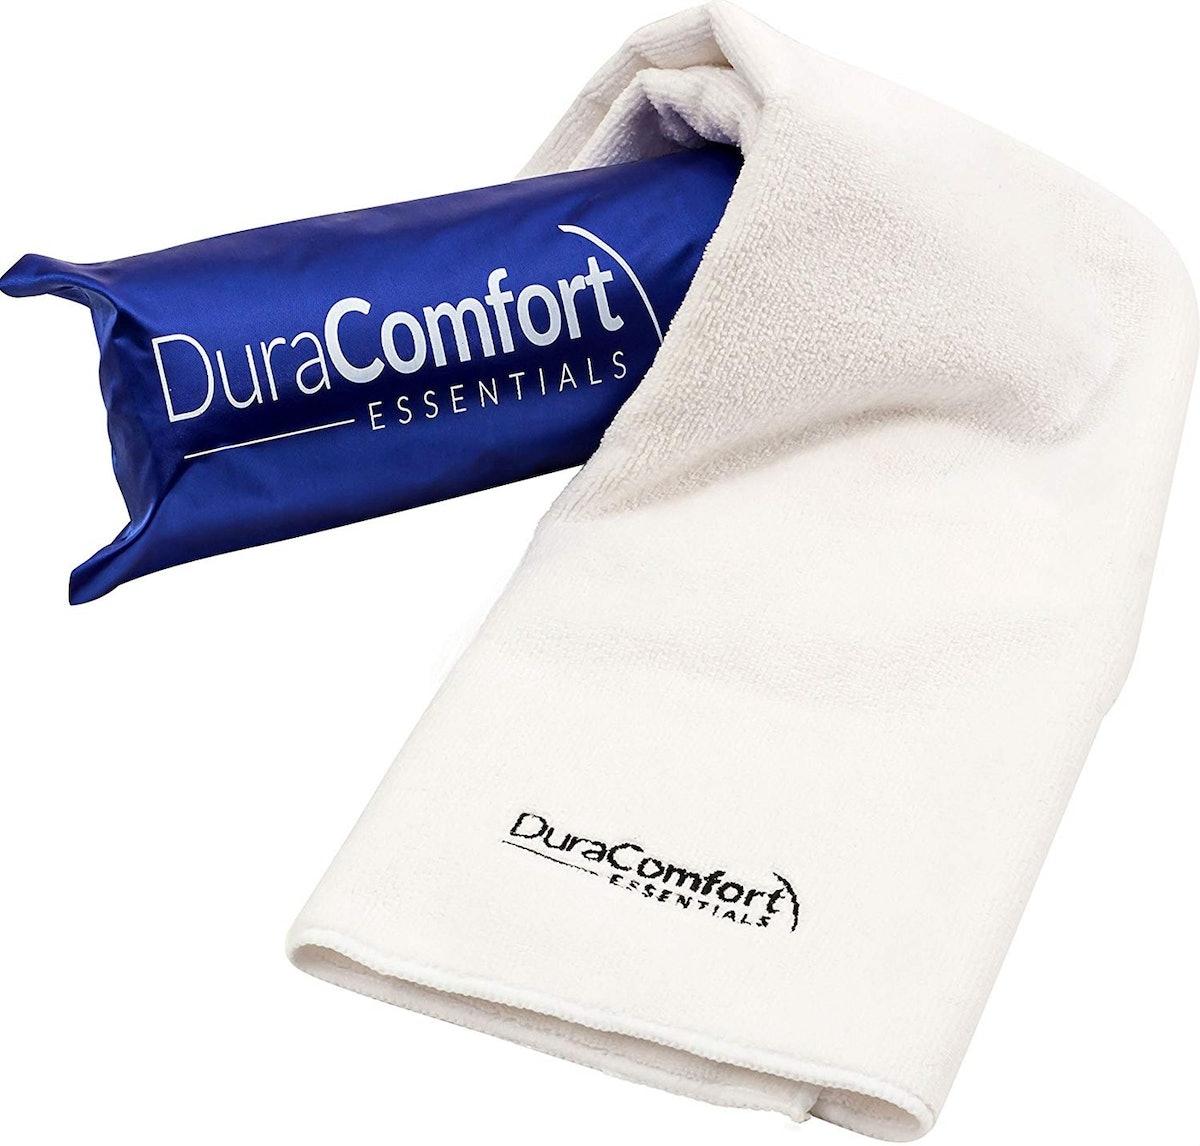 DuraComfort Essentials Super Absorbent Anti-Frizz Microfiber Hair Towel